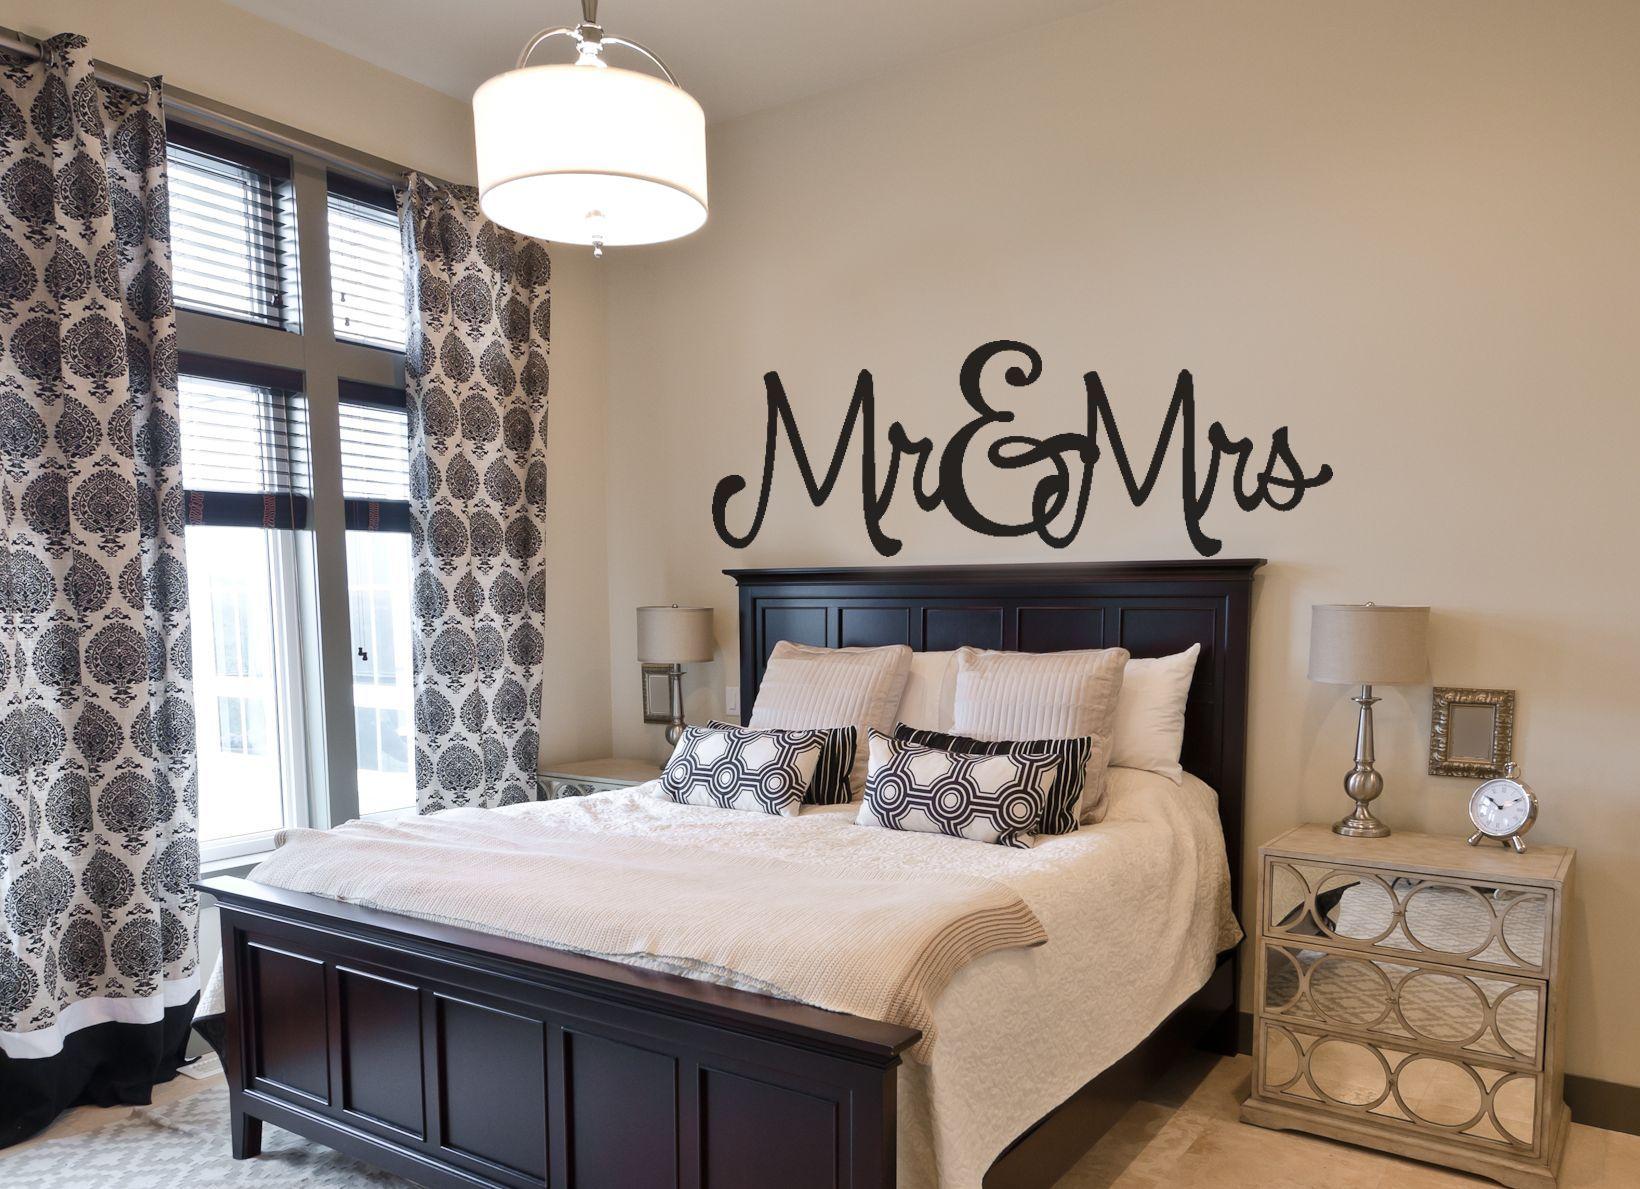 Bedroom Wall Decal Mr Mrs Wall Decor Bedroom Master Bedroom